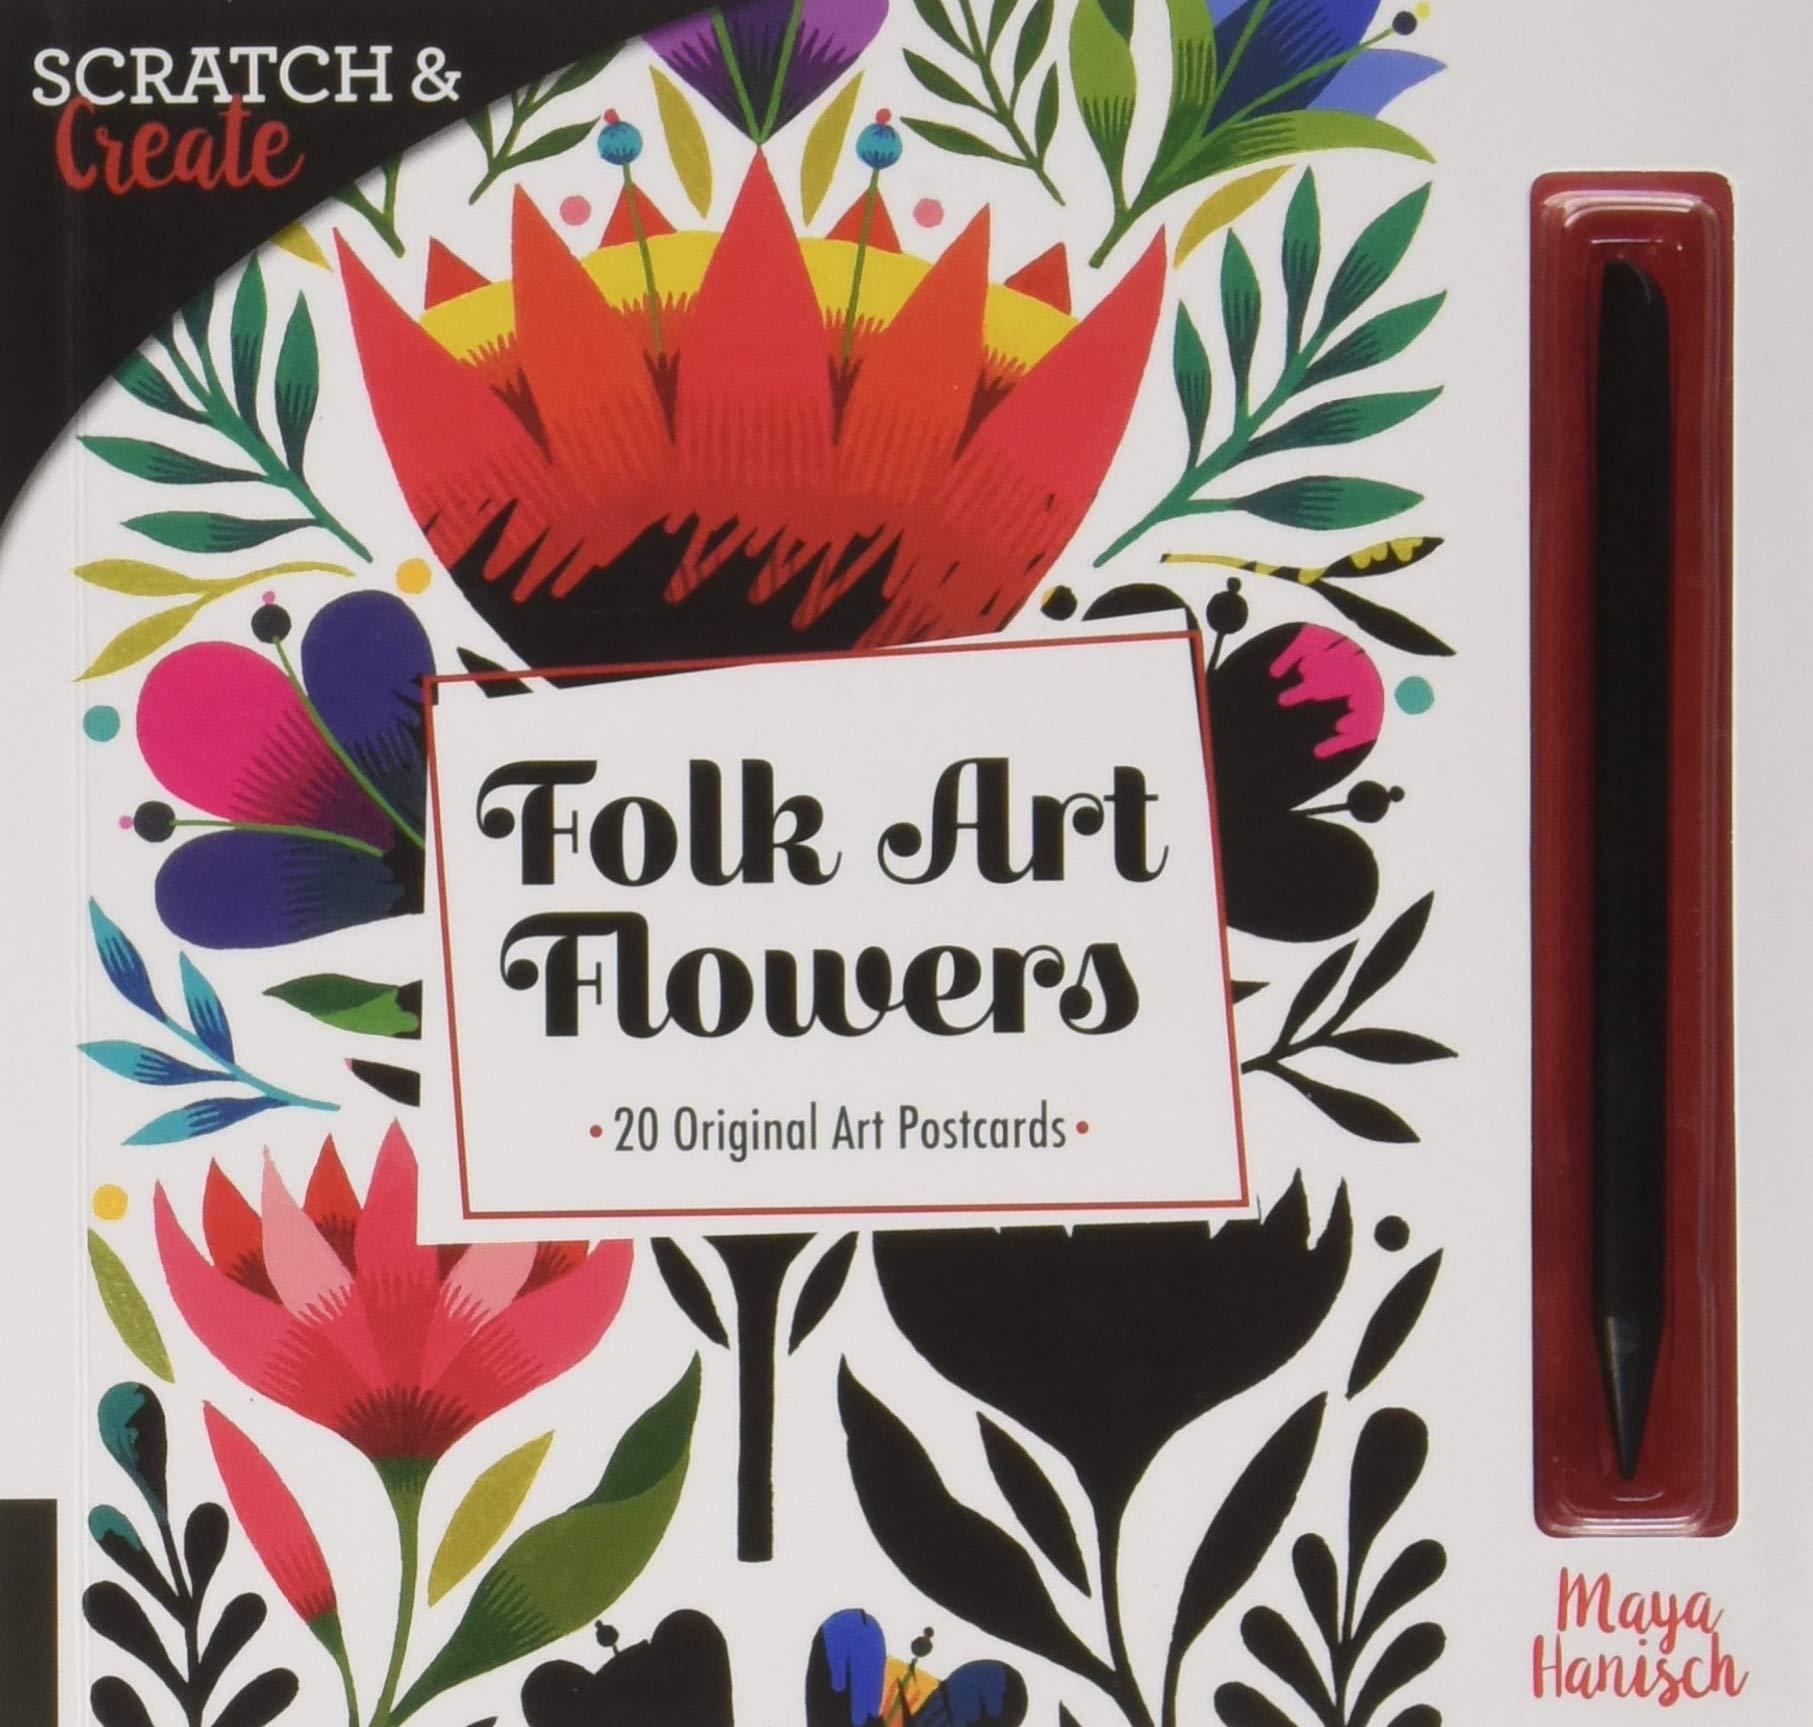 Download Scratch & Create Folk Art Flowers: 20 Original Art Postcards pdf epub